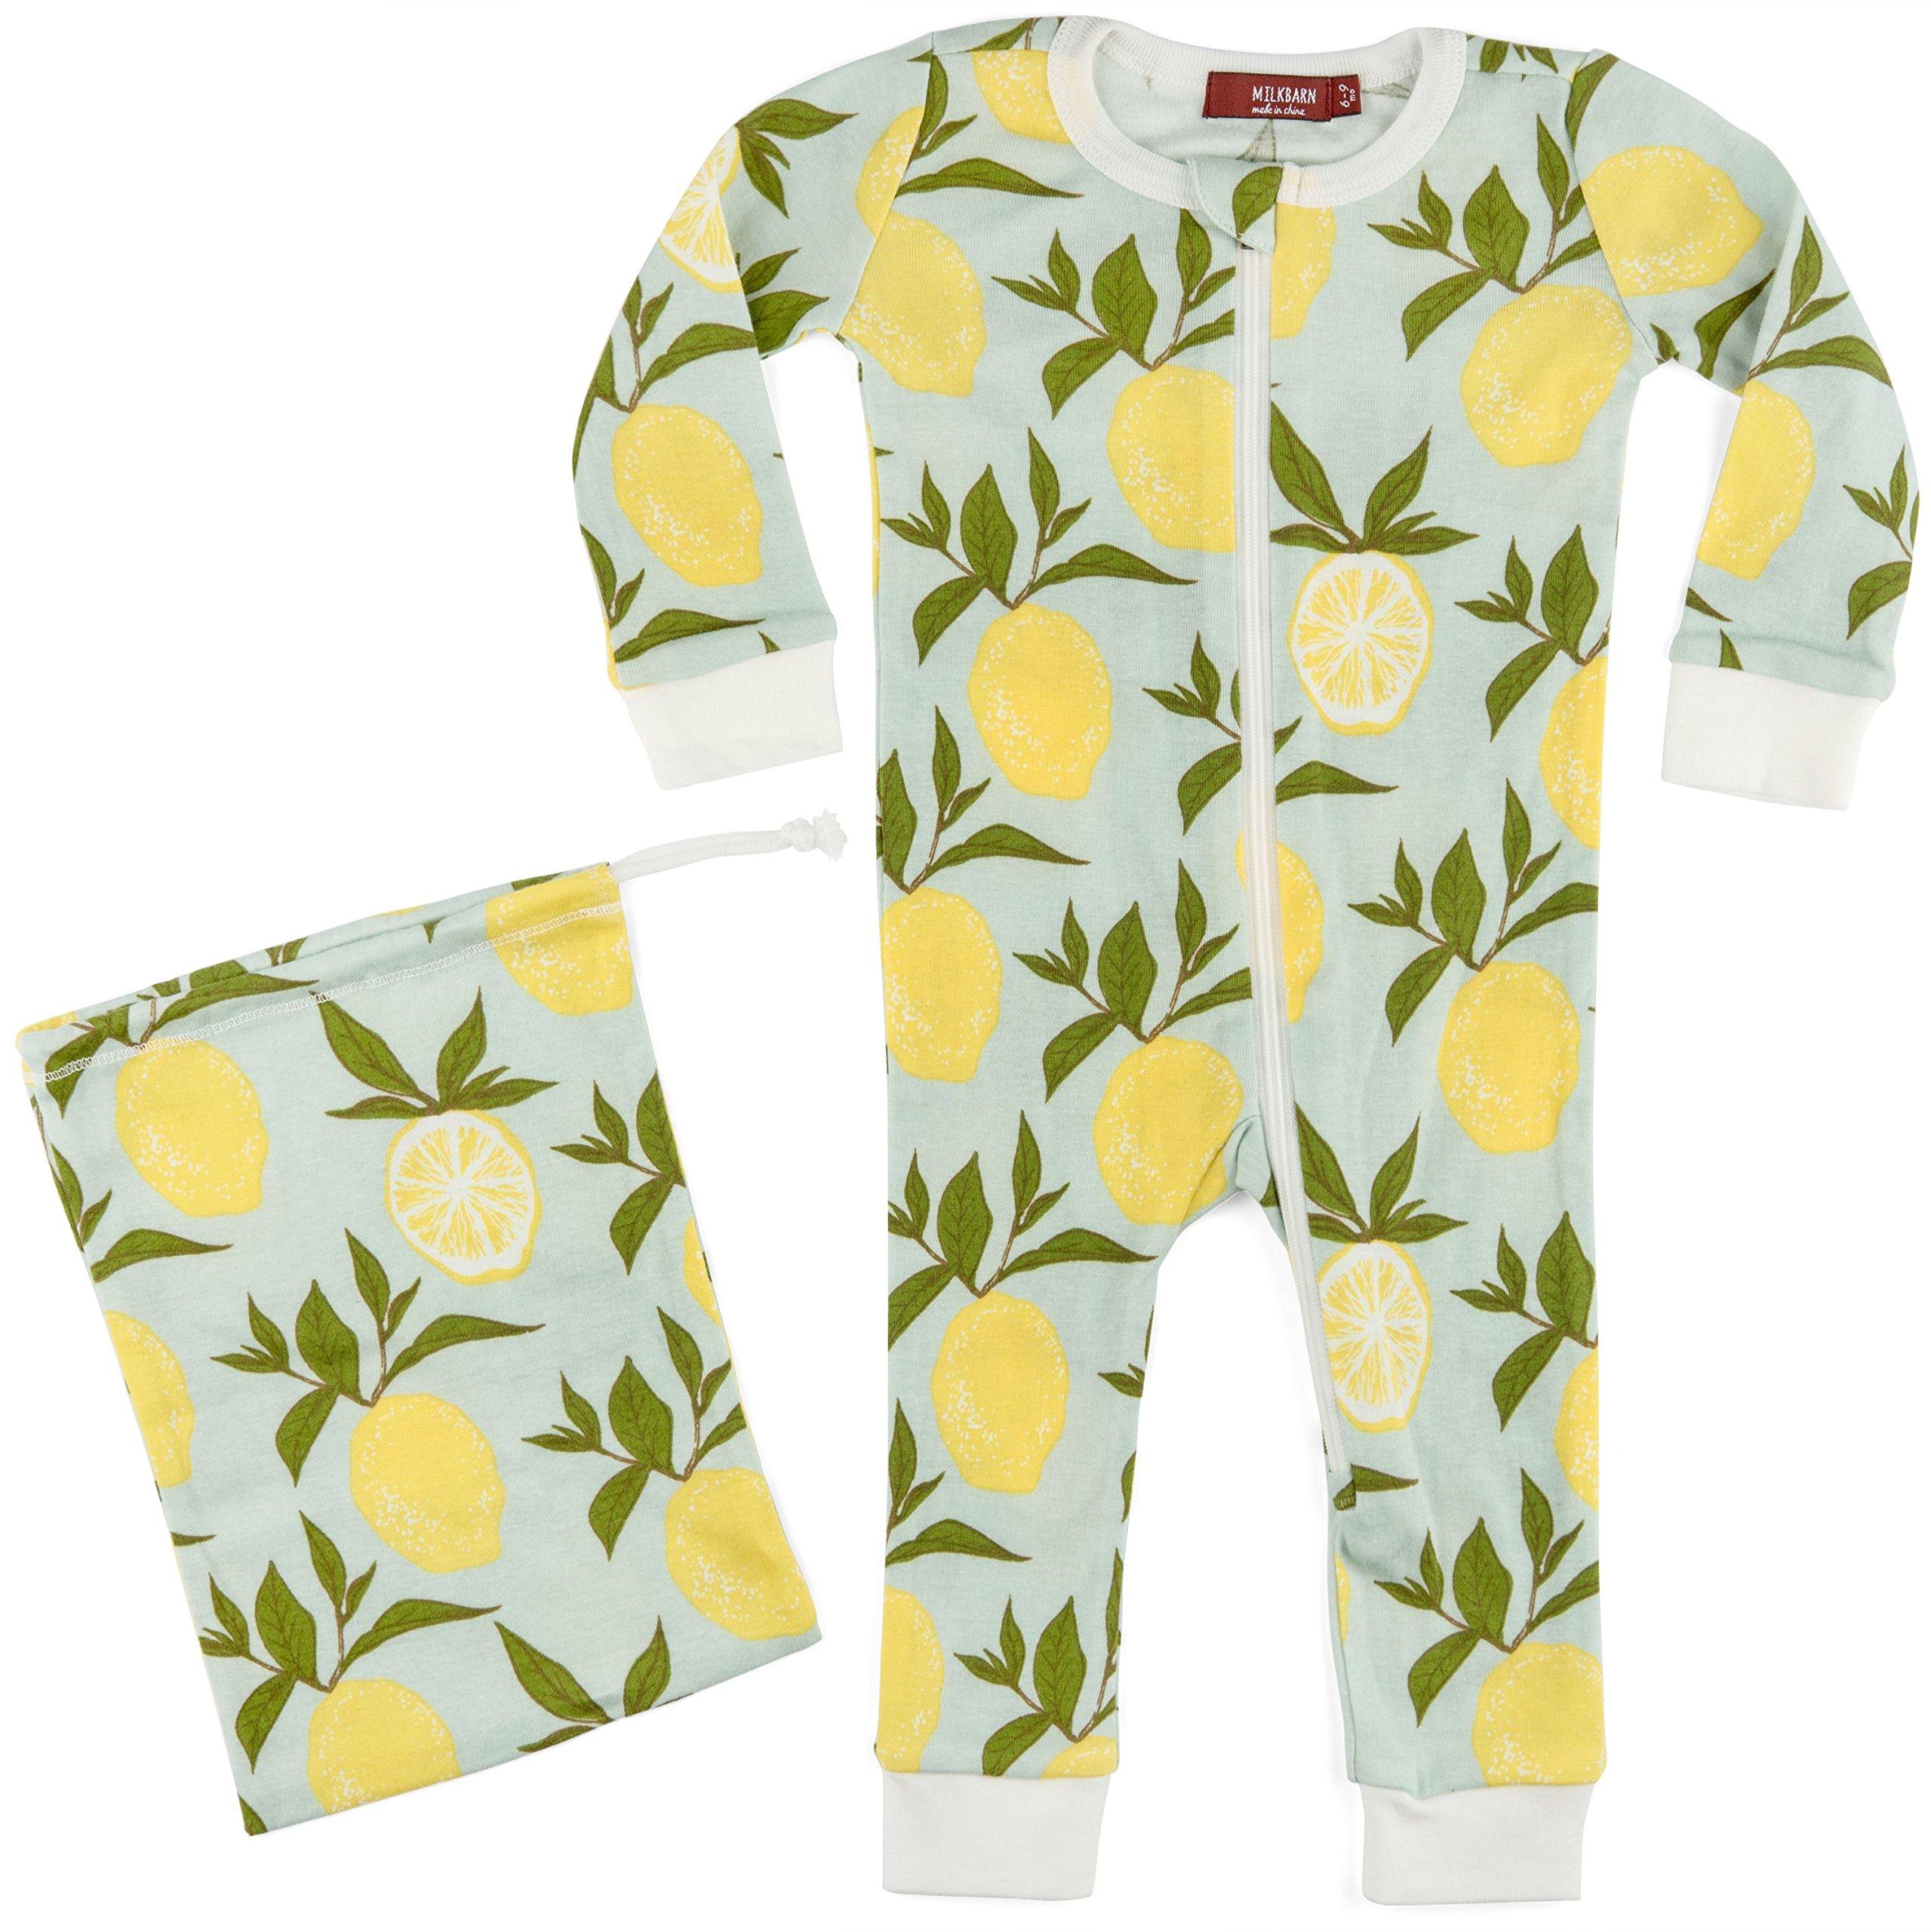 MilkBarn Organic Cotton Zipper Pajama - Lemon (18-24 Months) by MilkBarn